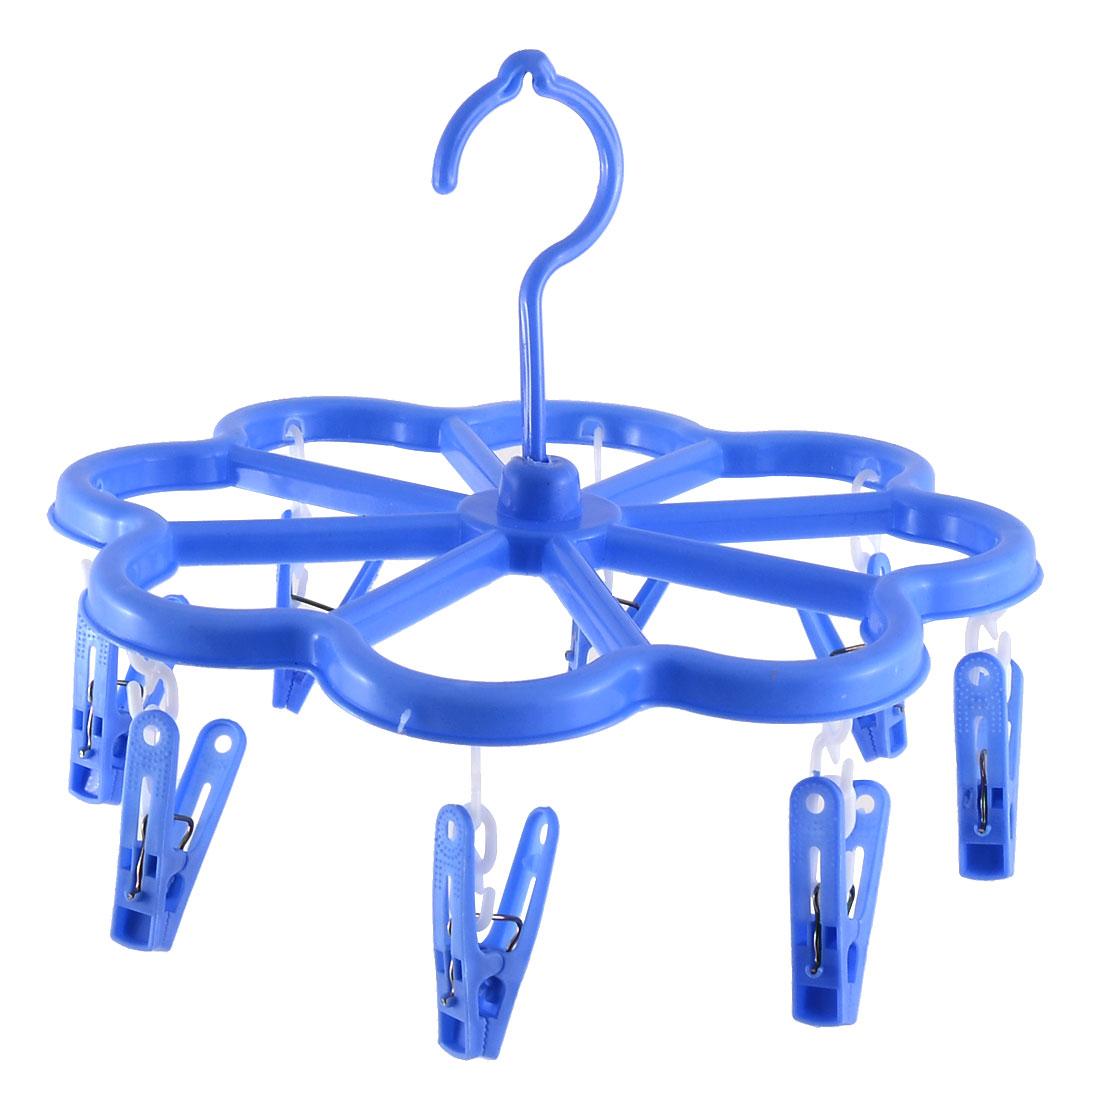 Plastic Flower Shaped 8 Clips Underwear Bra Shoelace Socks Clothes Hanger Peg Sky Blue